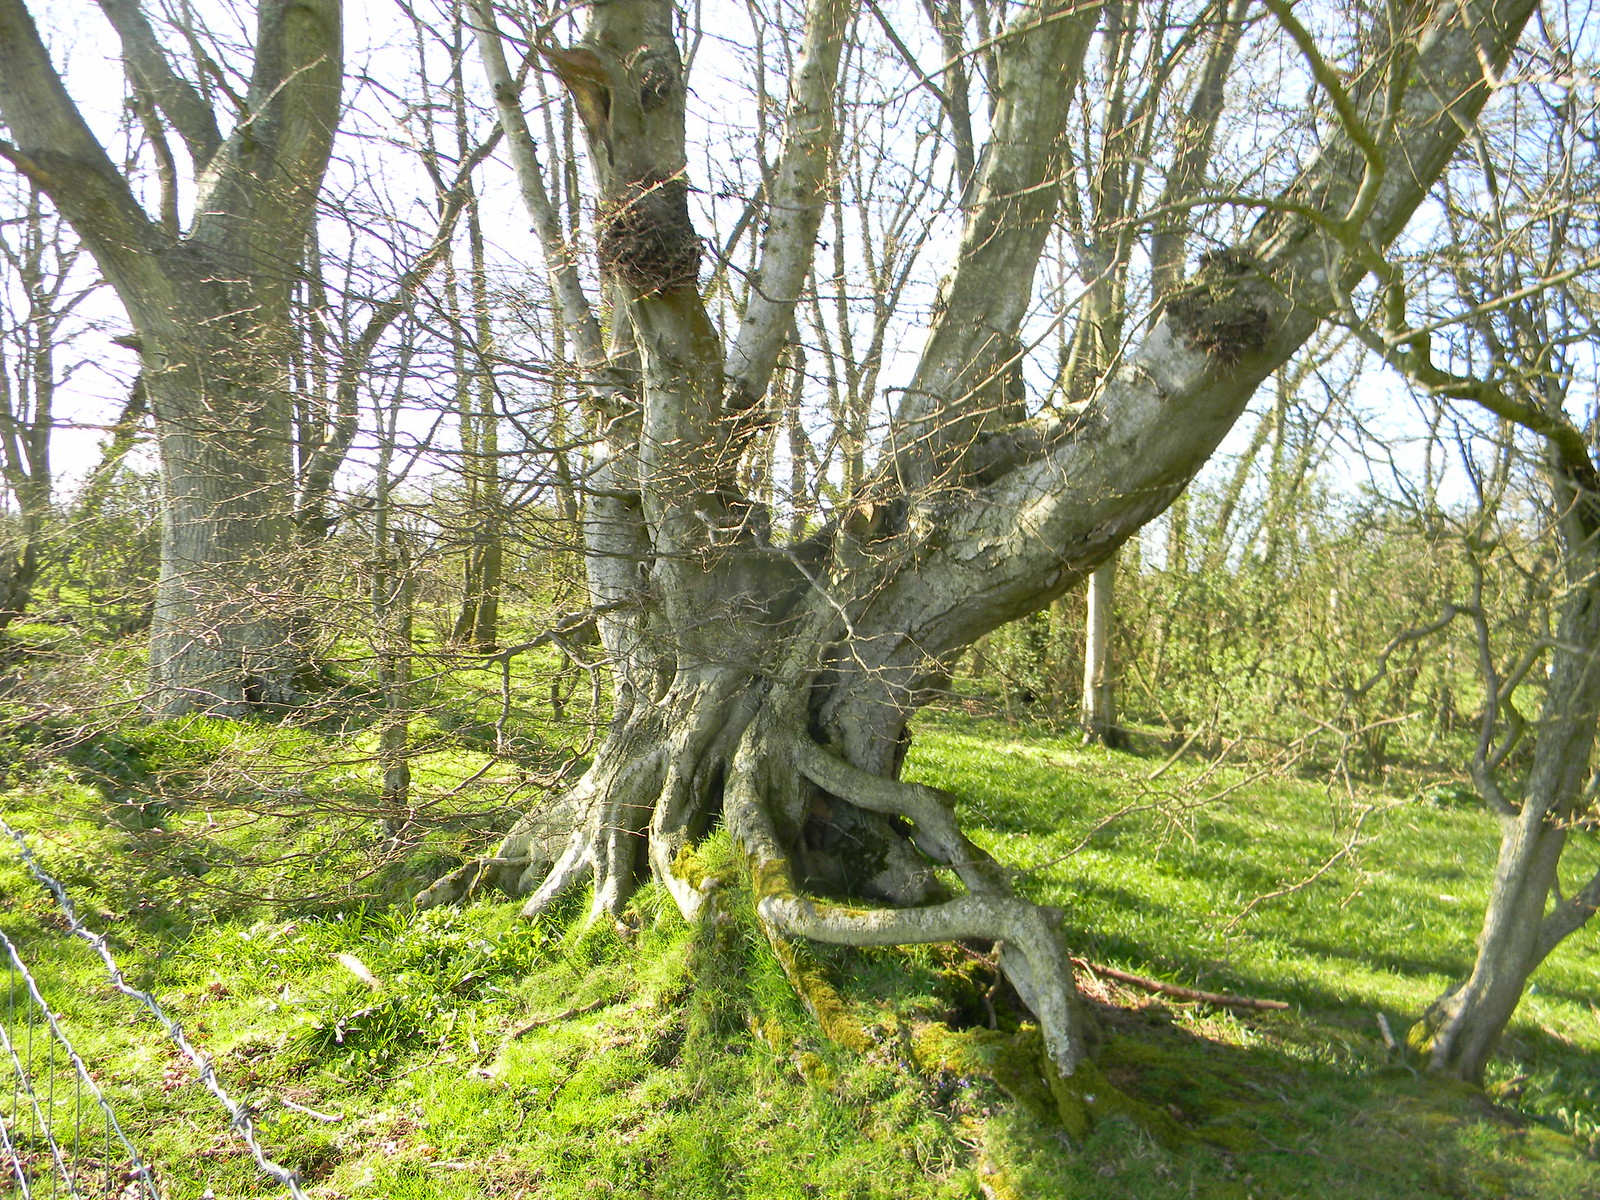 Gnarled tree with moss Robertsbridge to Battle